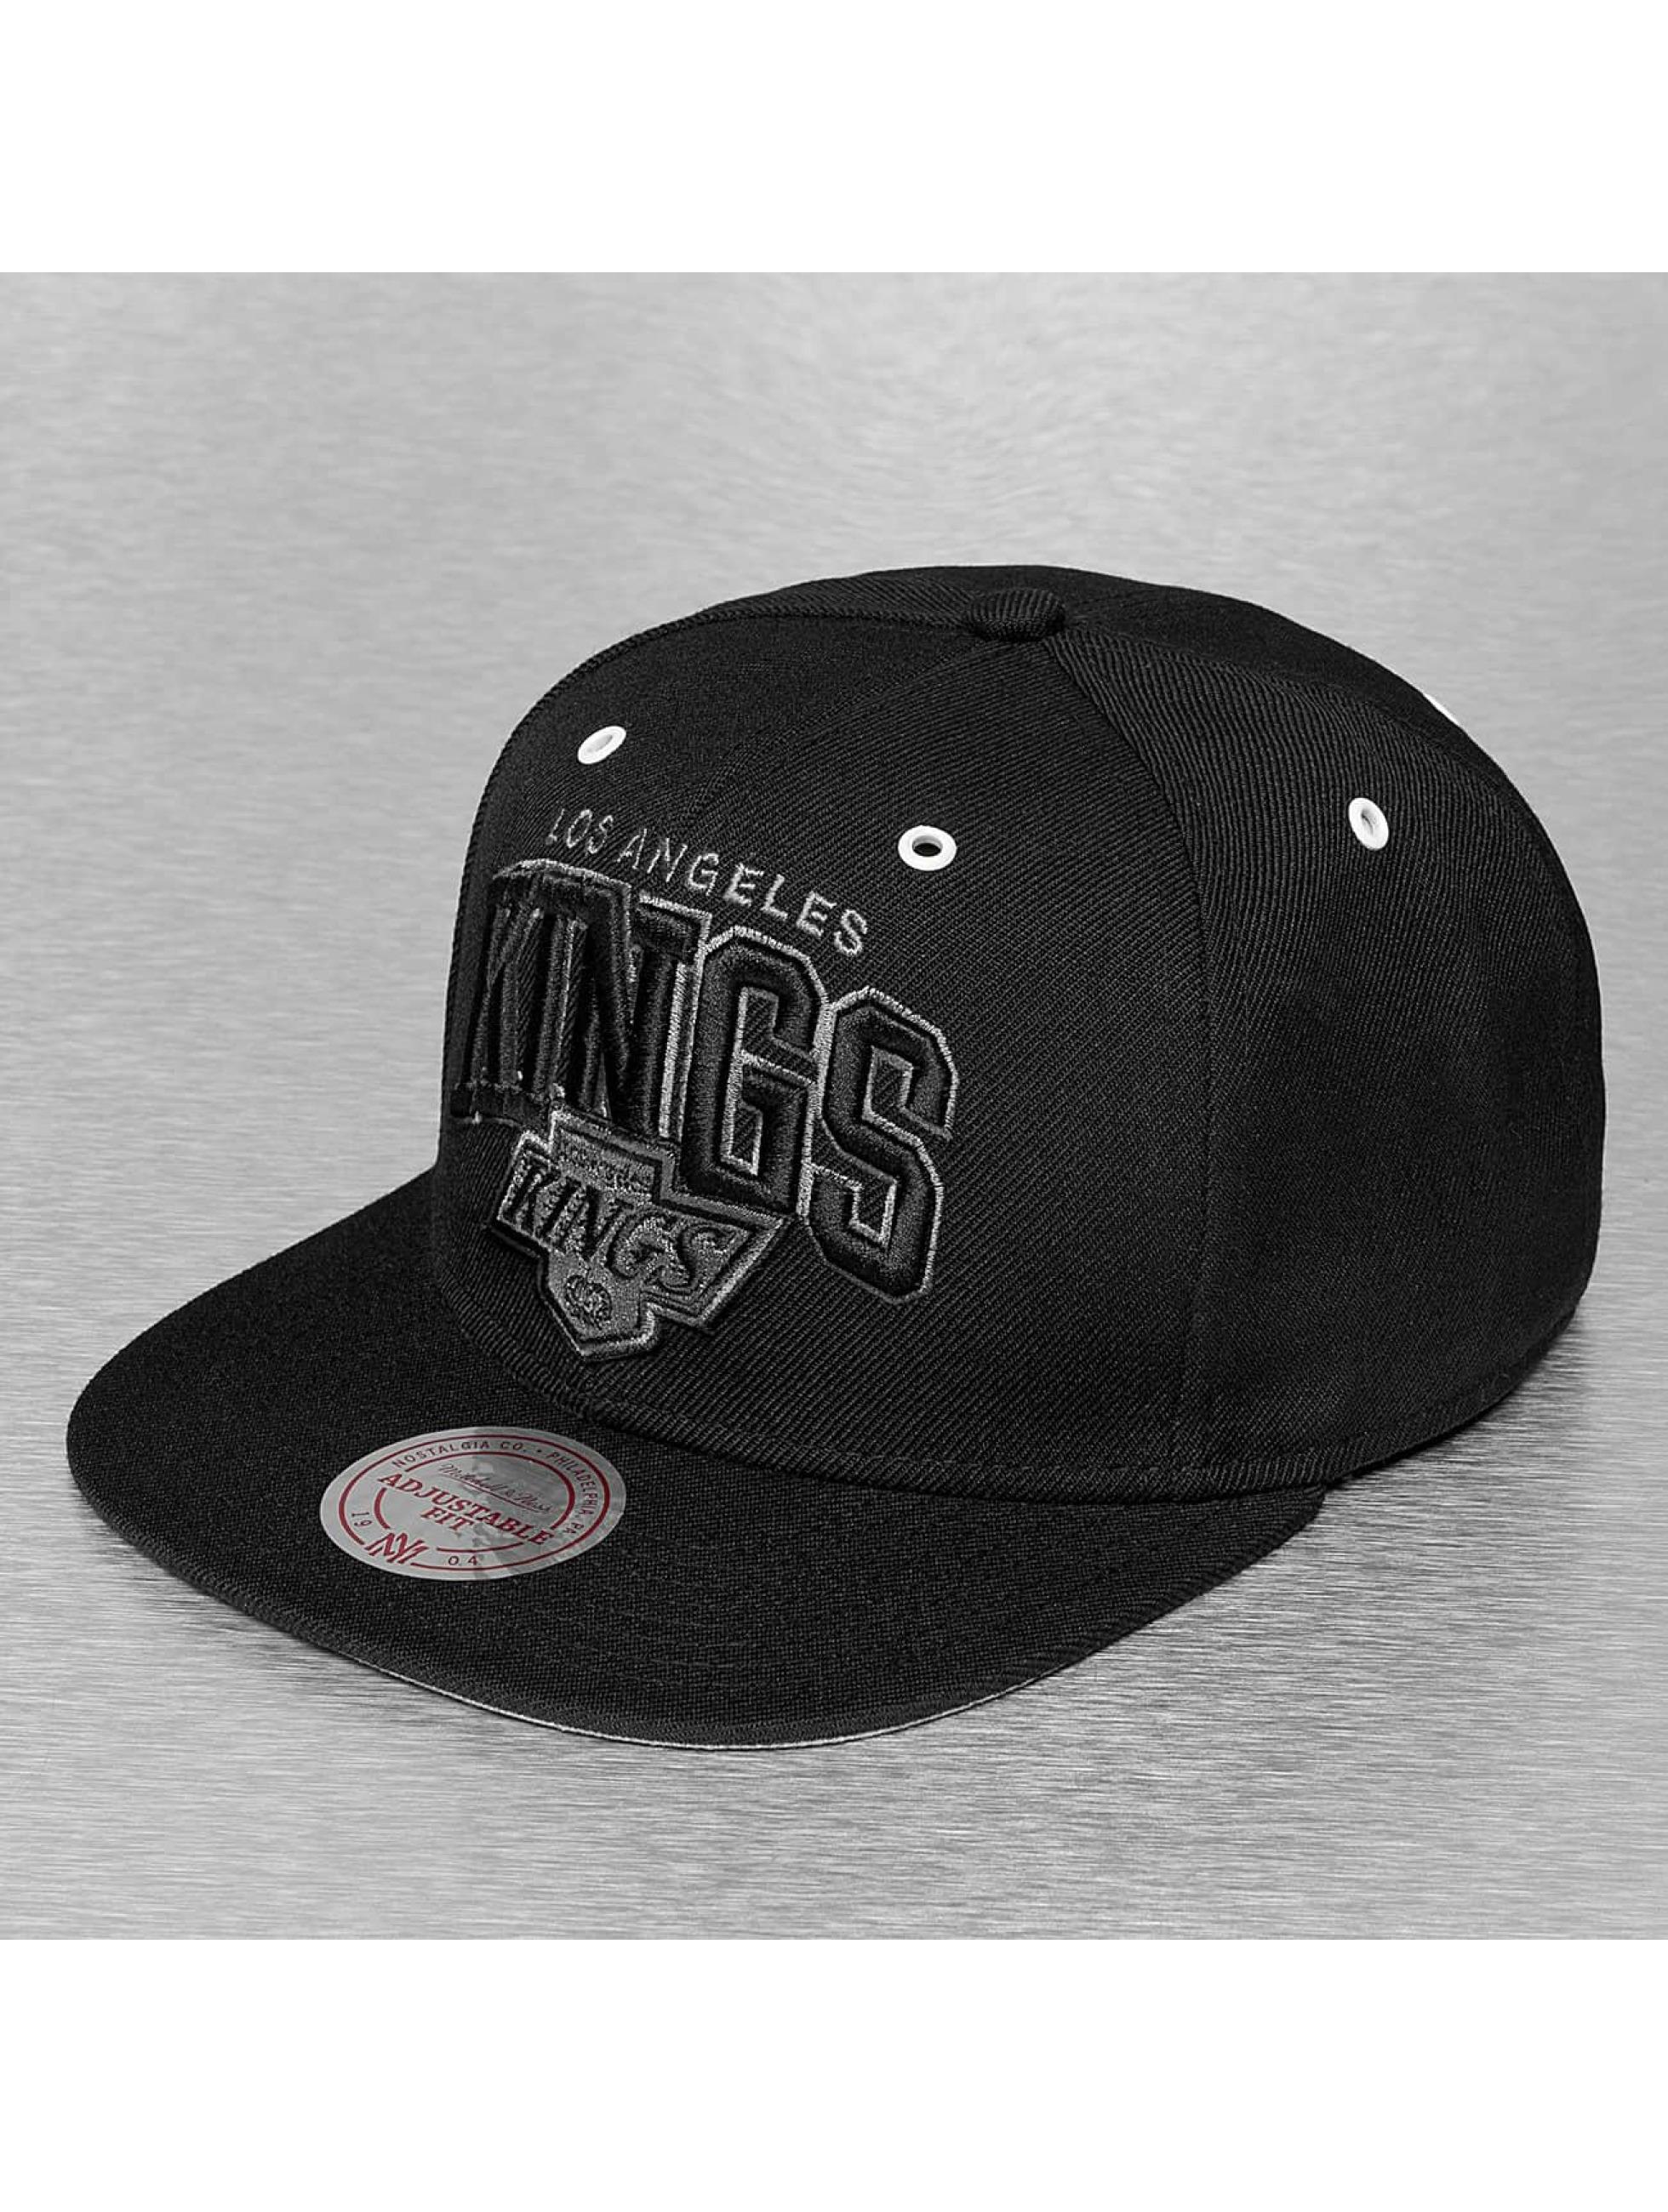 Mitchell & Ness Männer,Frauen Snapback Cap BGW LA Kings in schwarz